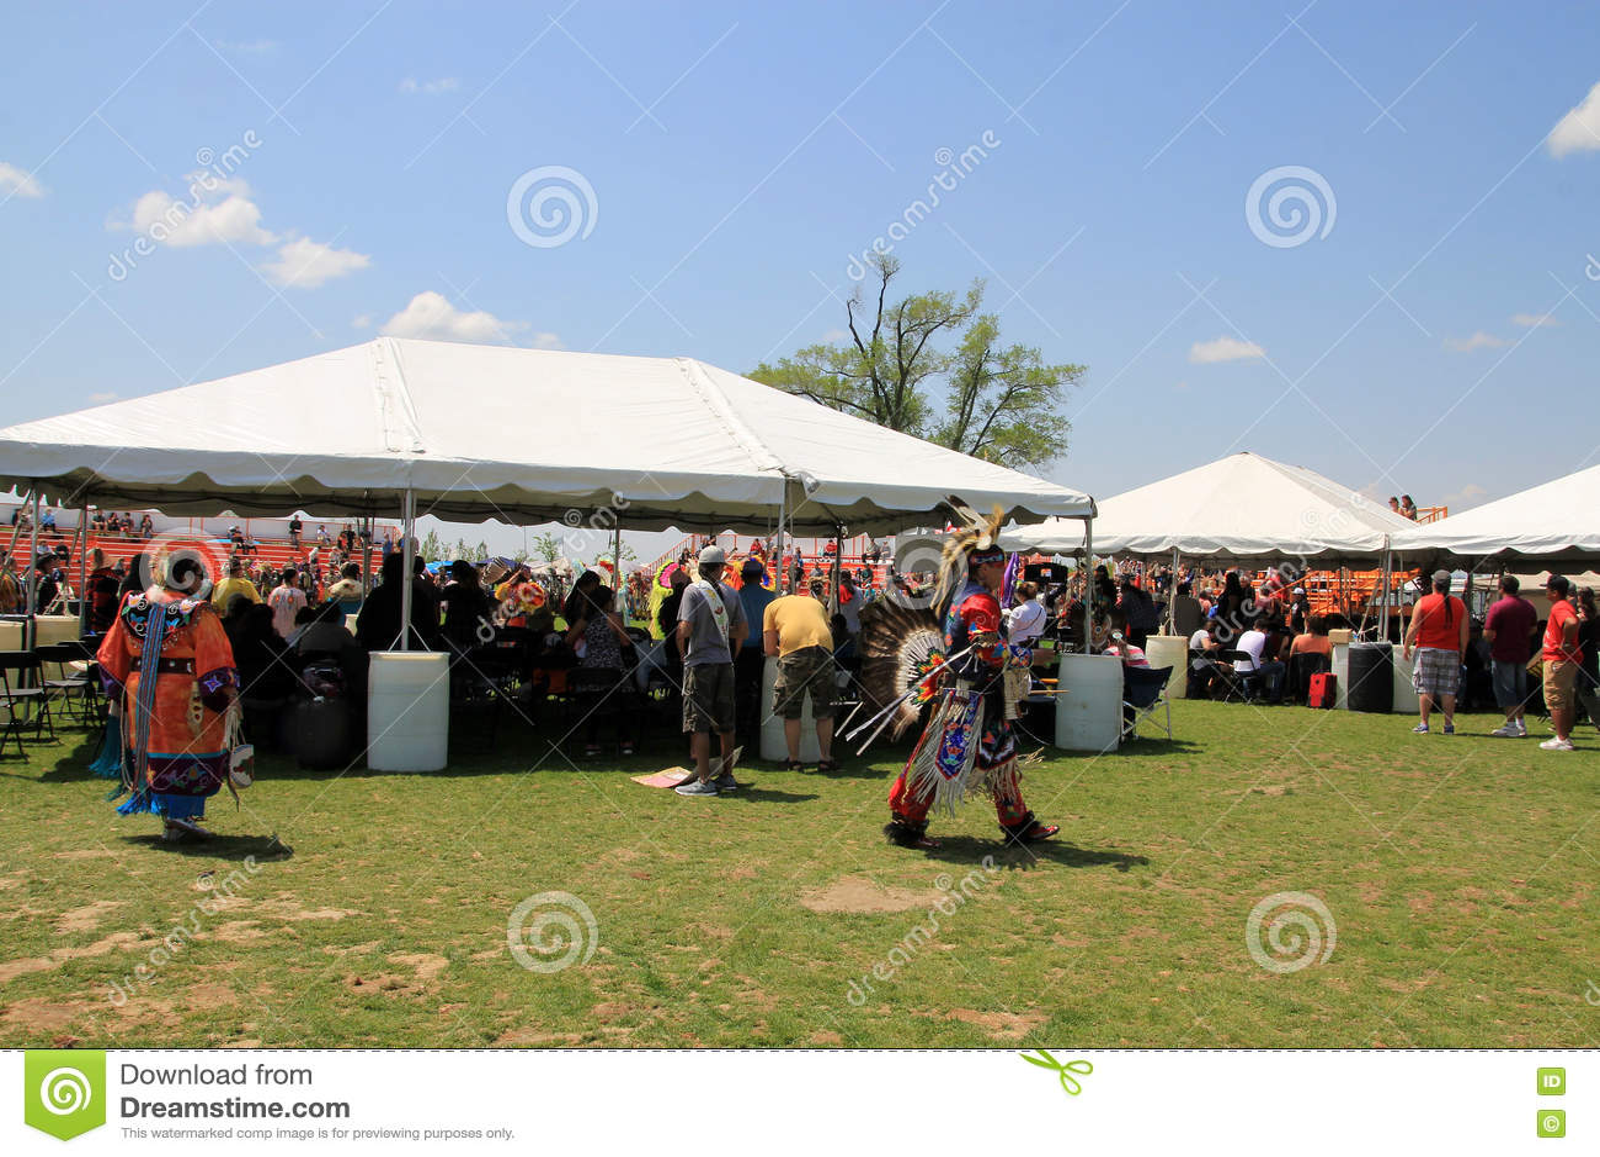 Aboriginal Dancer At Indigenous Cultural Festival